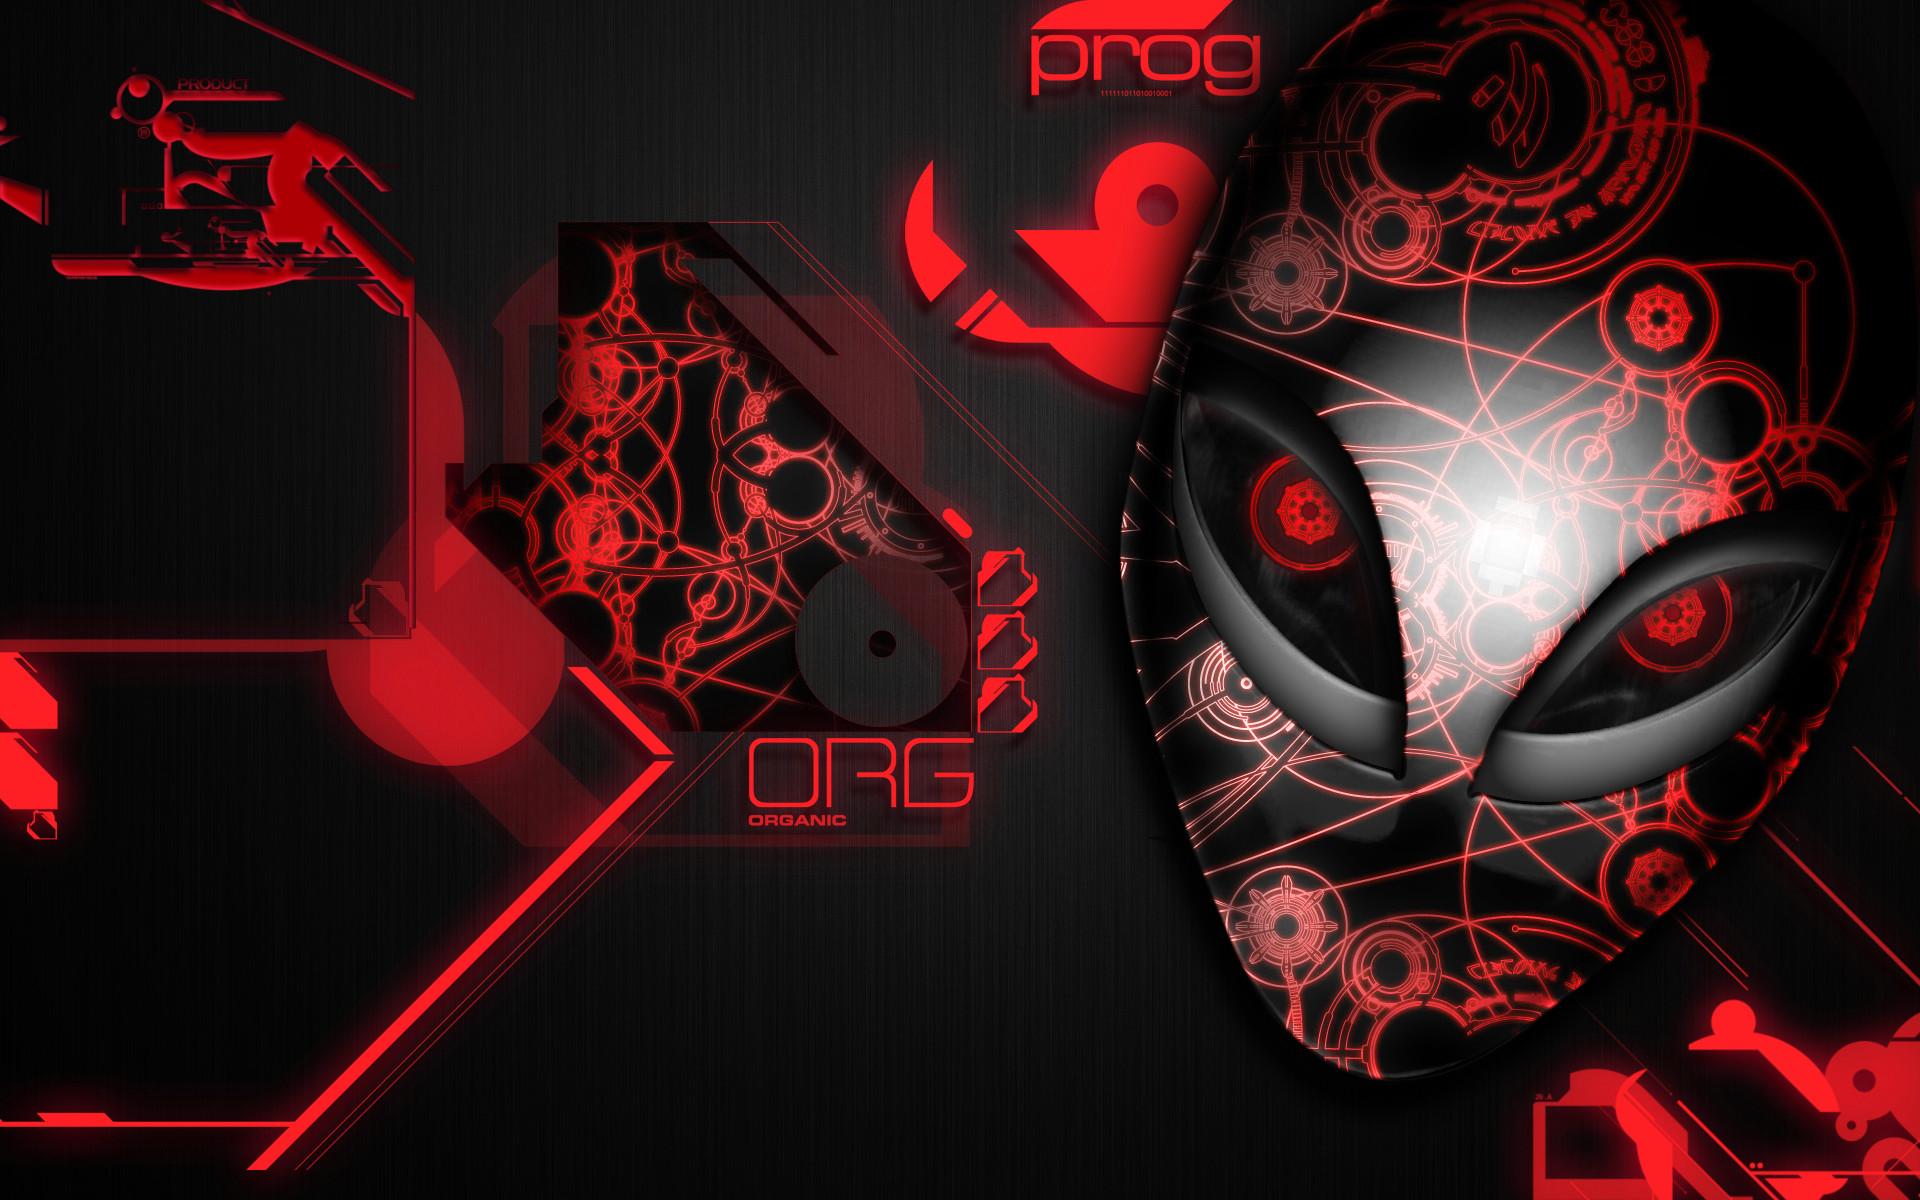 1920x1200 alienware desktop background red organic design 1920x1200